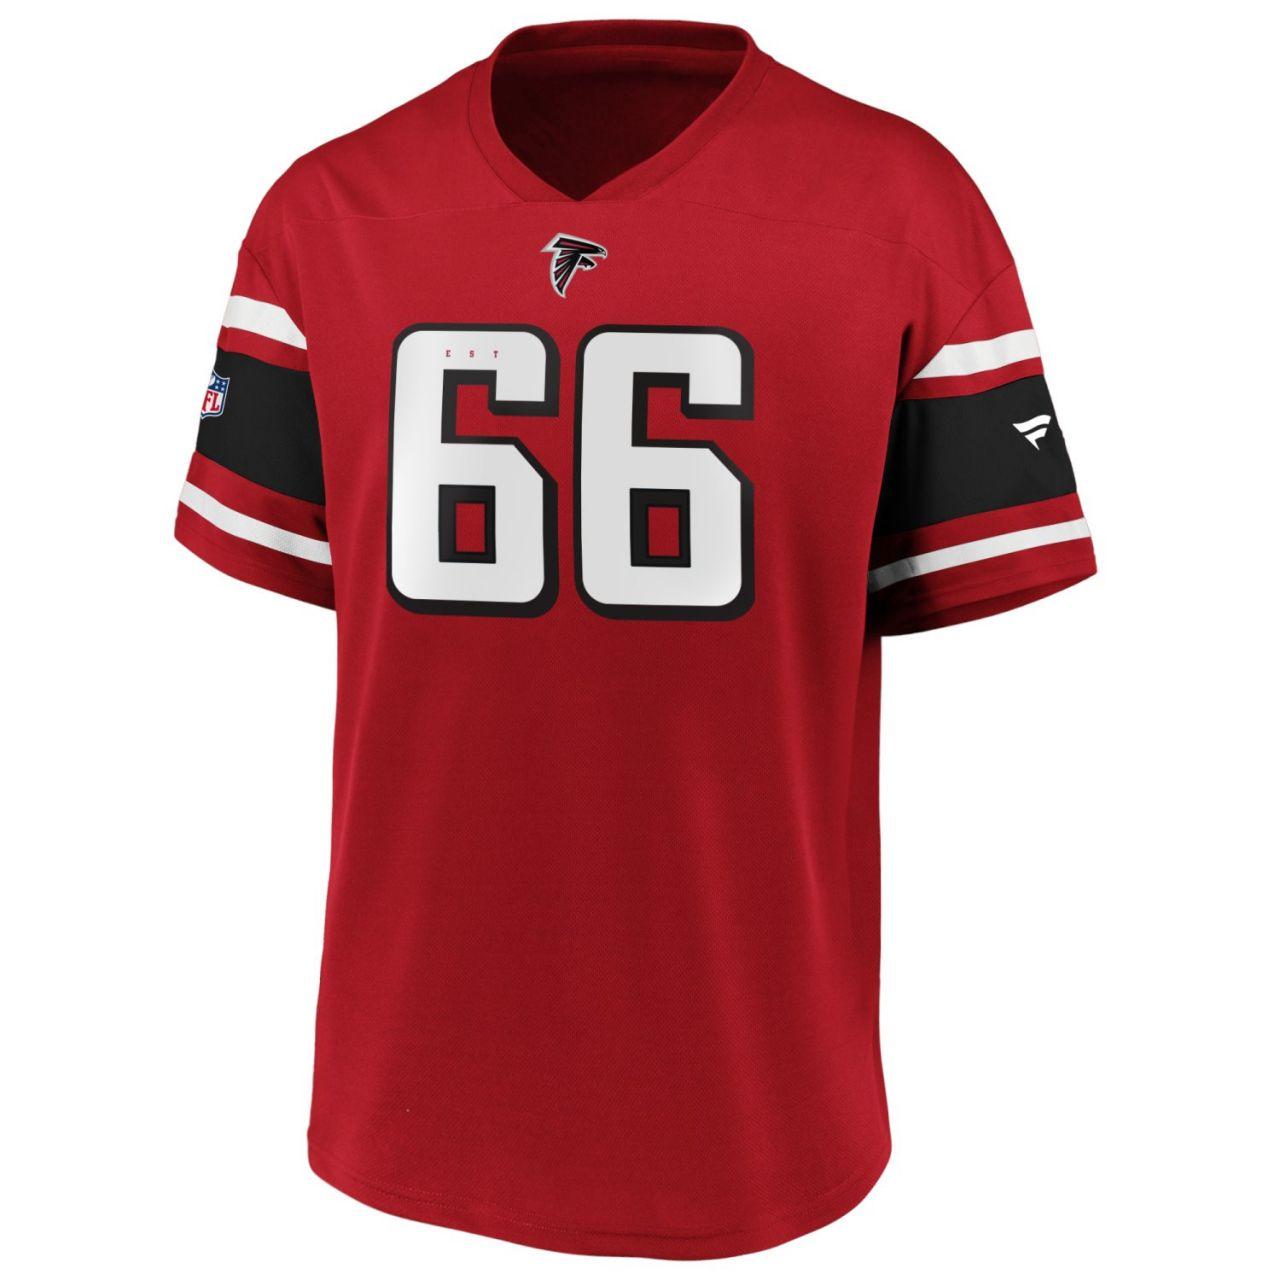 amfoo - Iconic Poly Mesh Supporters Jersey - Atlanta Falcons